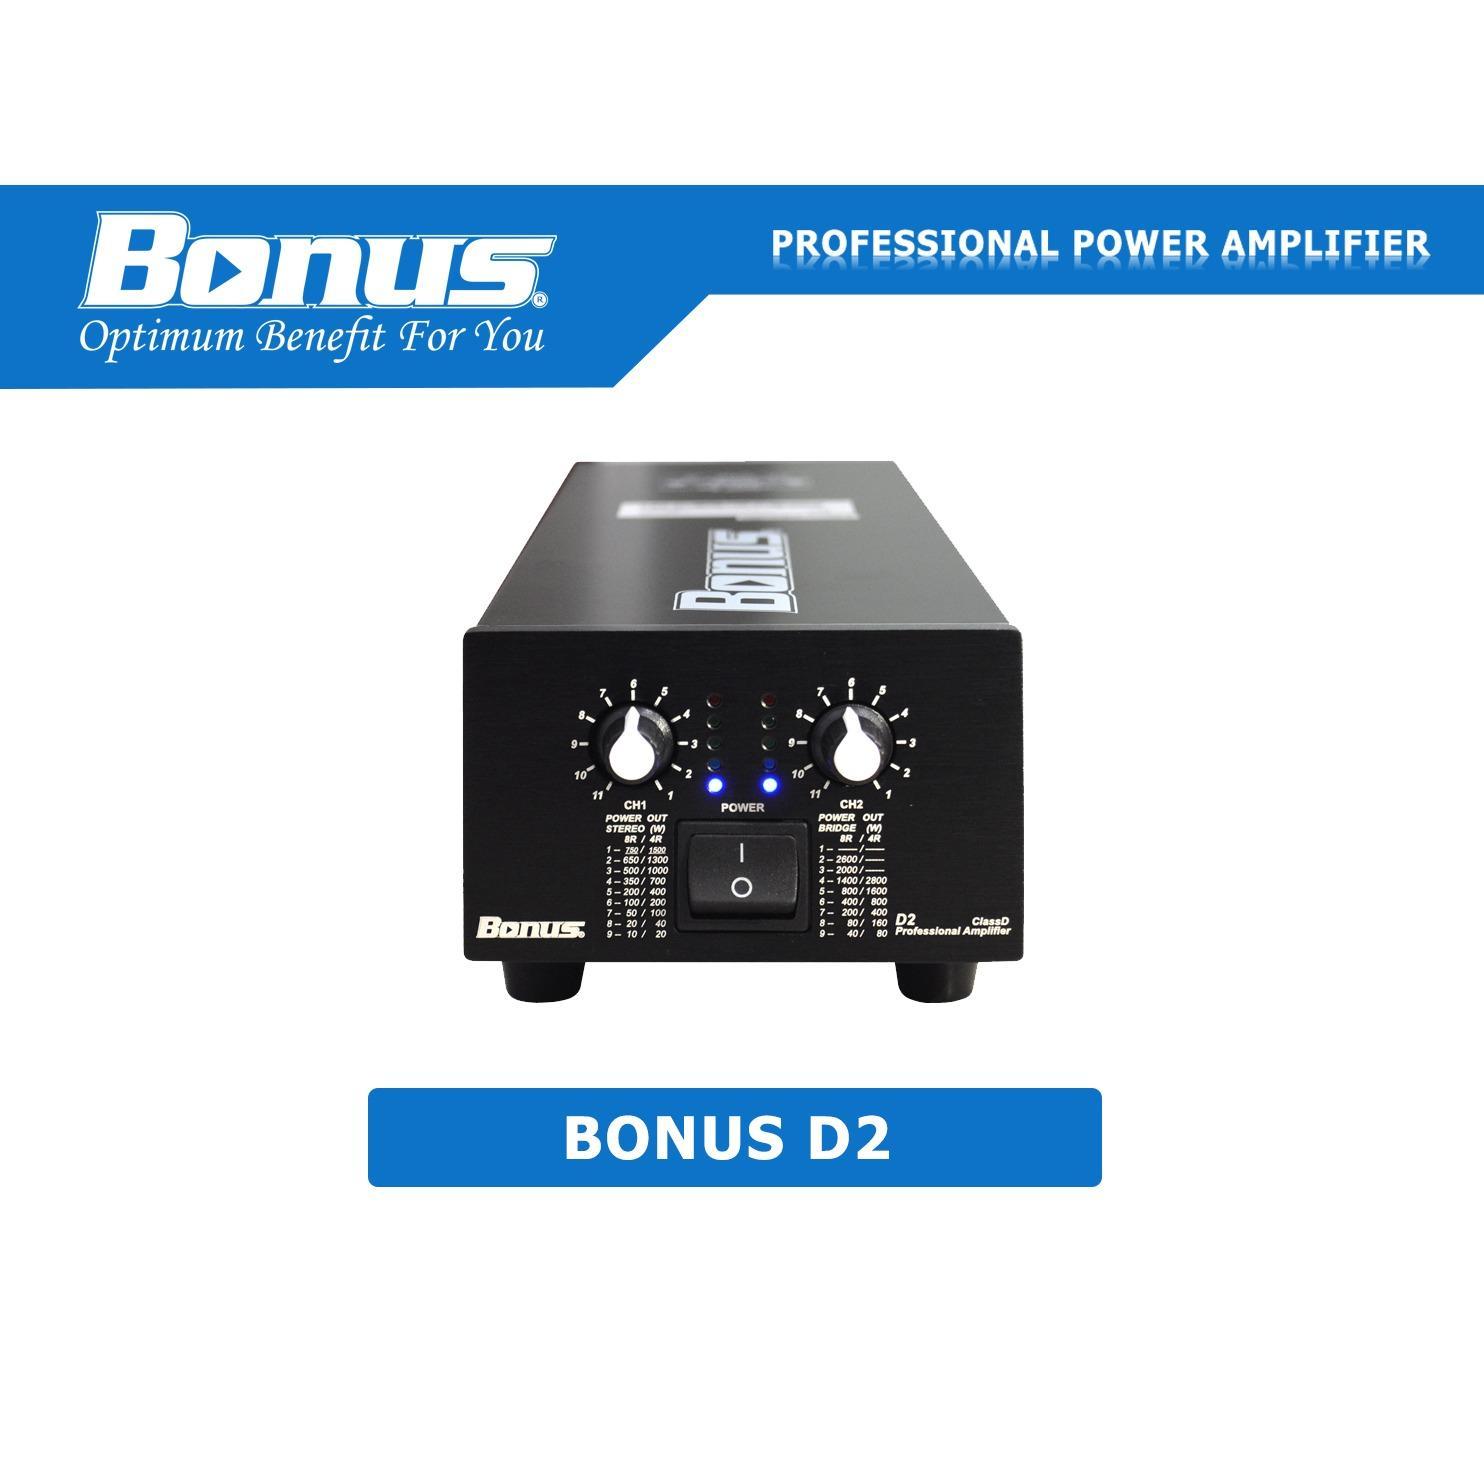 Mua Cục Đẩy Power Amplifier Bonus Audio D2 Trong Hồ Chí Minh